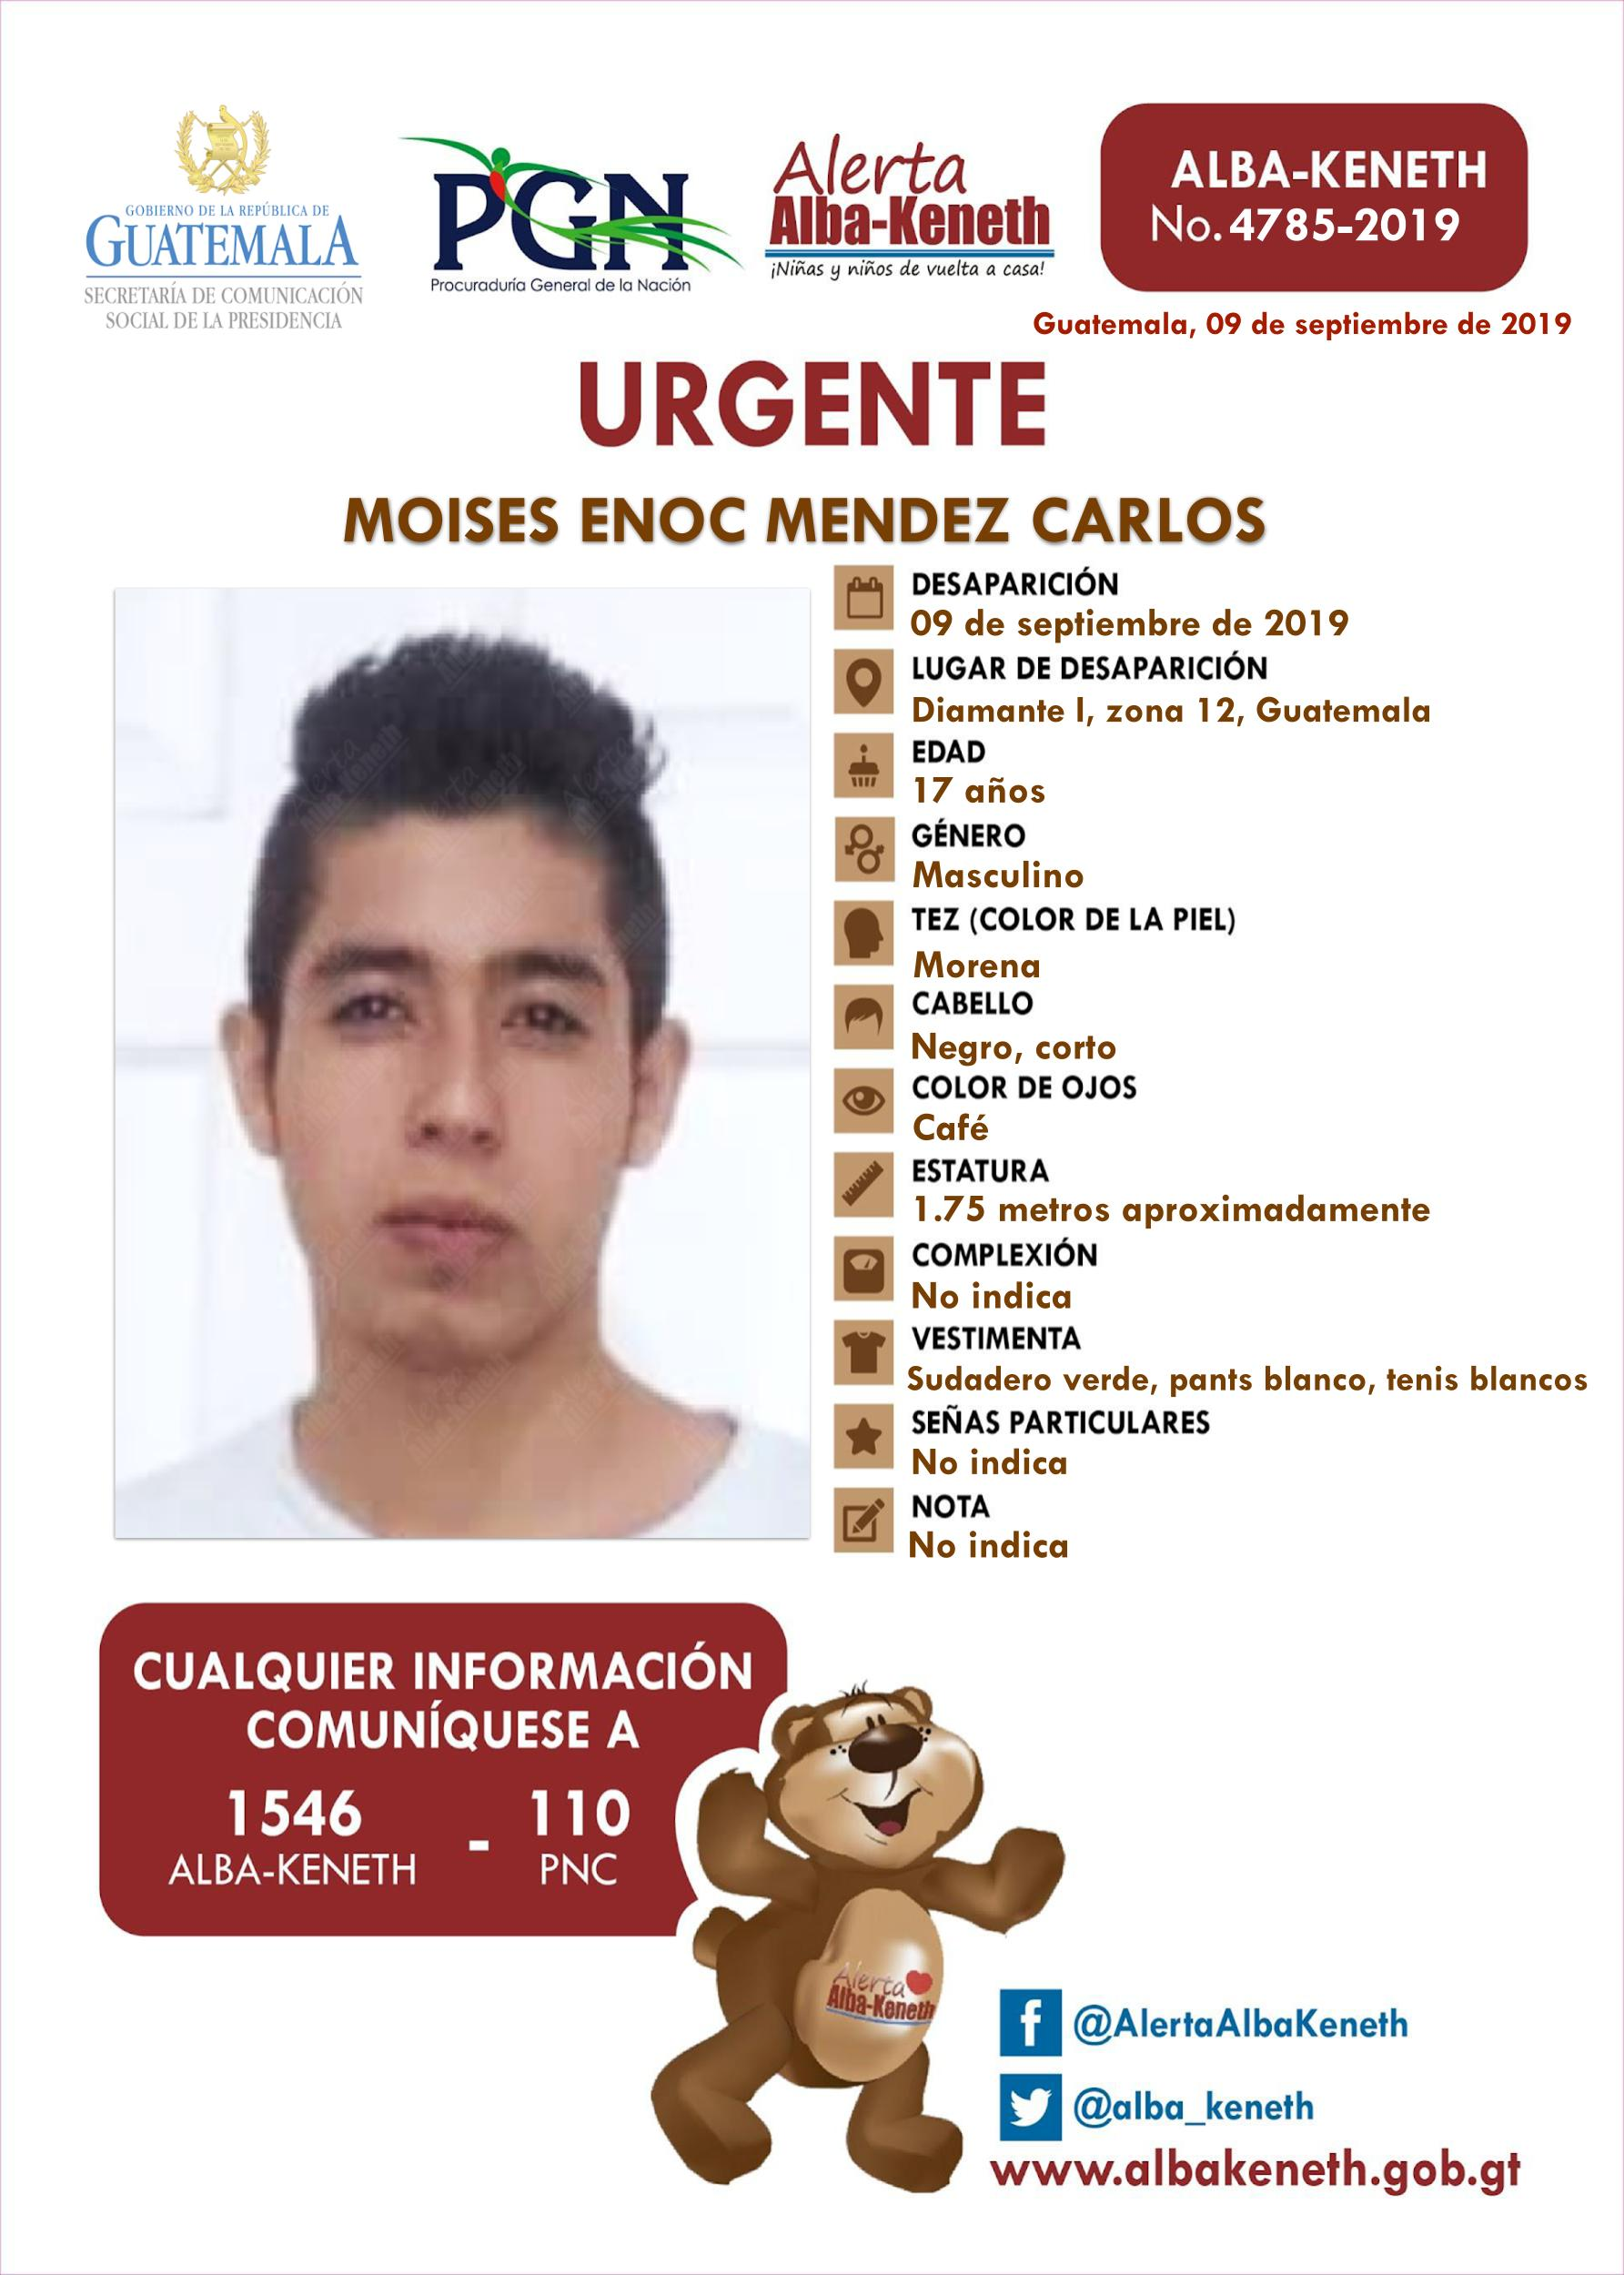 Moises Enoc Mendez Carlos